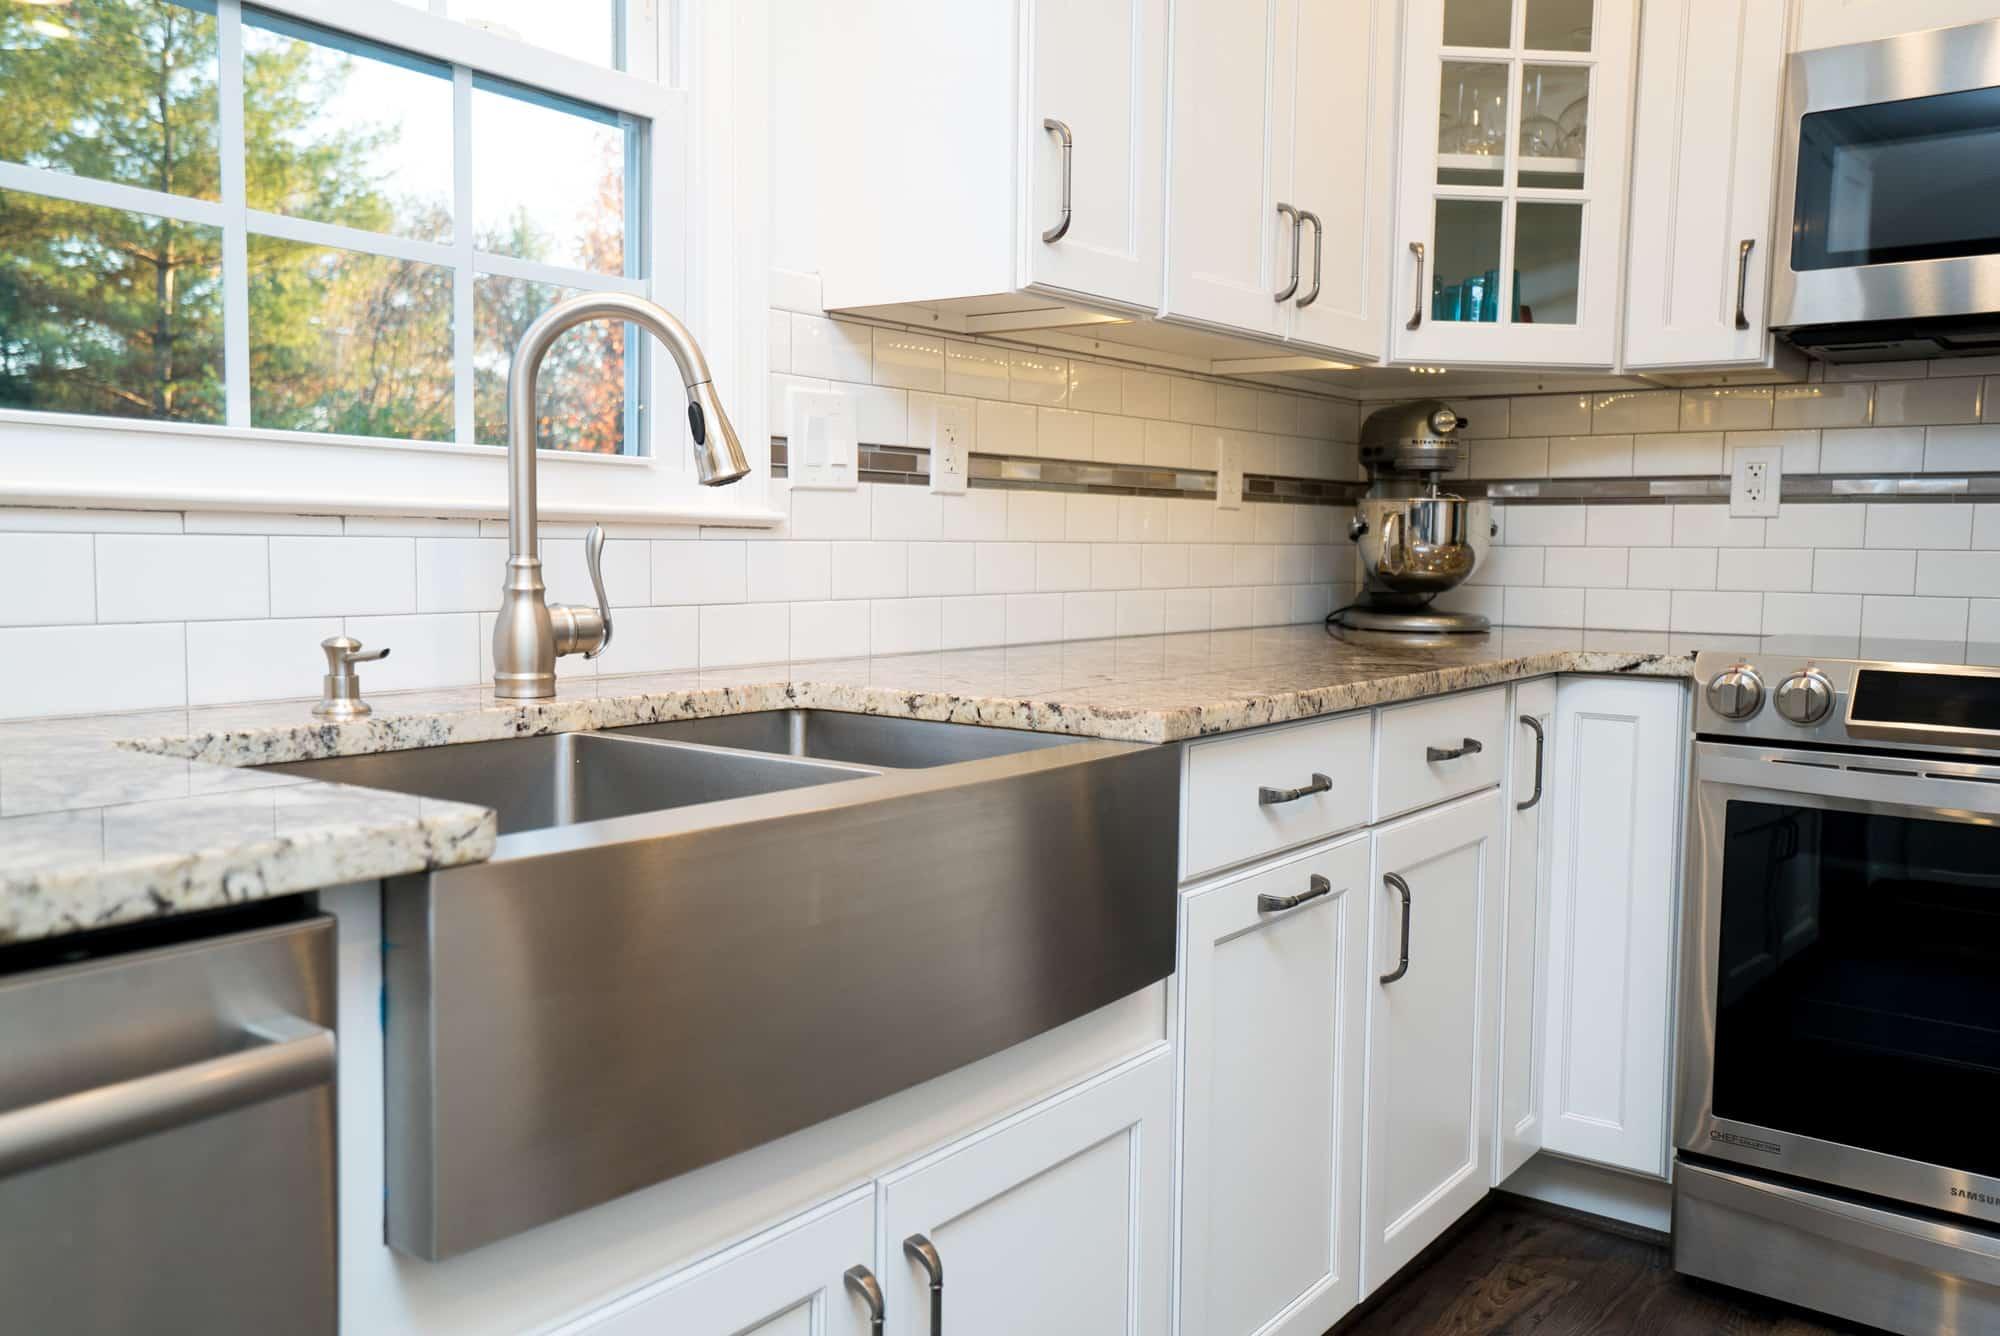 Natalie Brooks - Kitchen & Bath Remodeling/Cabinets | USA Cabinet Store